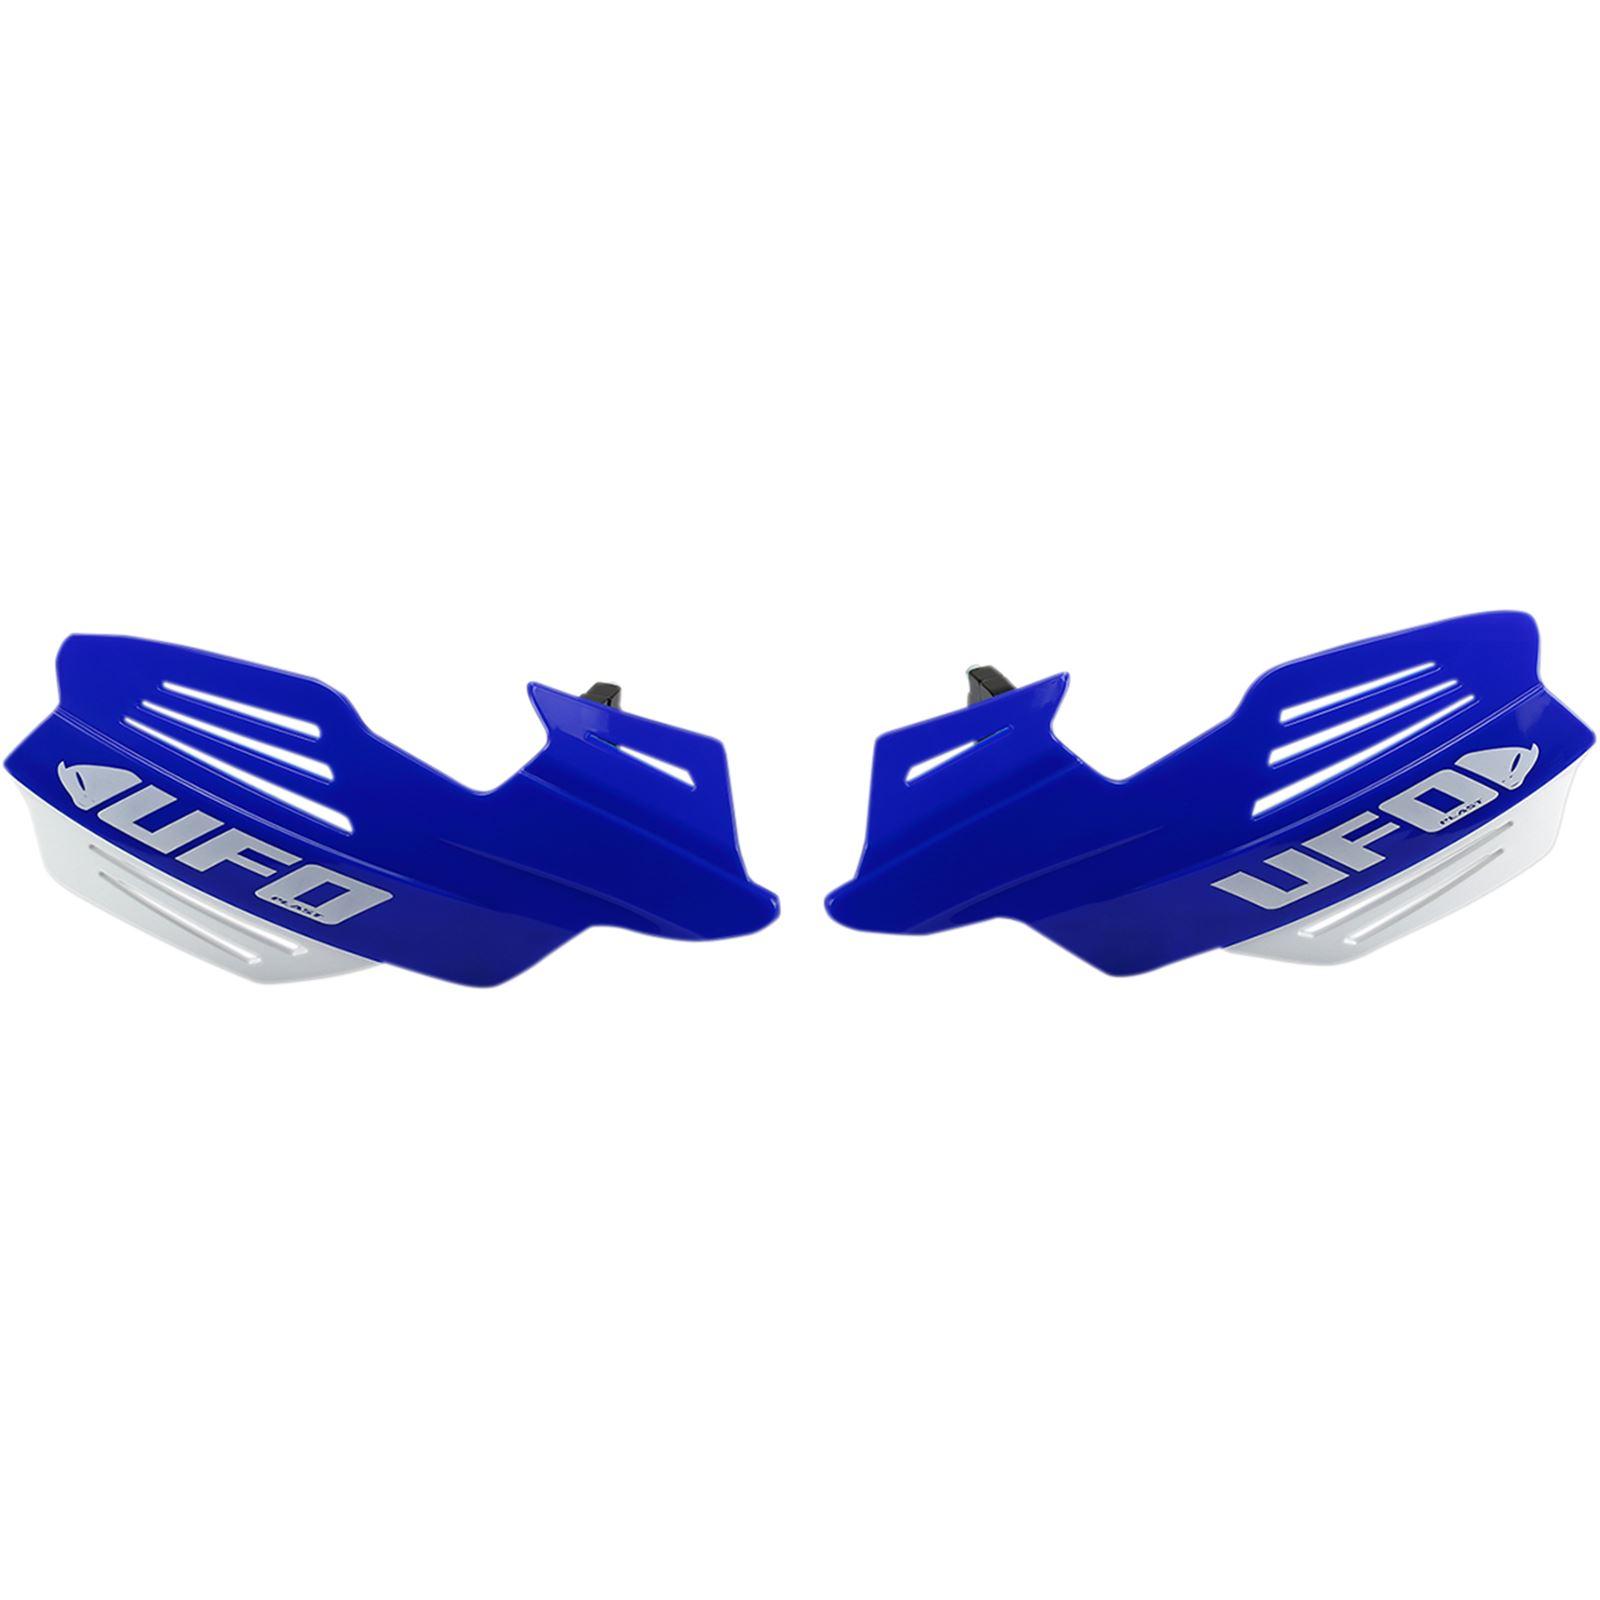 UFO Plastics Blue Vulcan Handguards